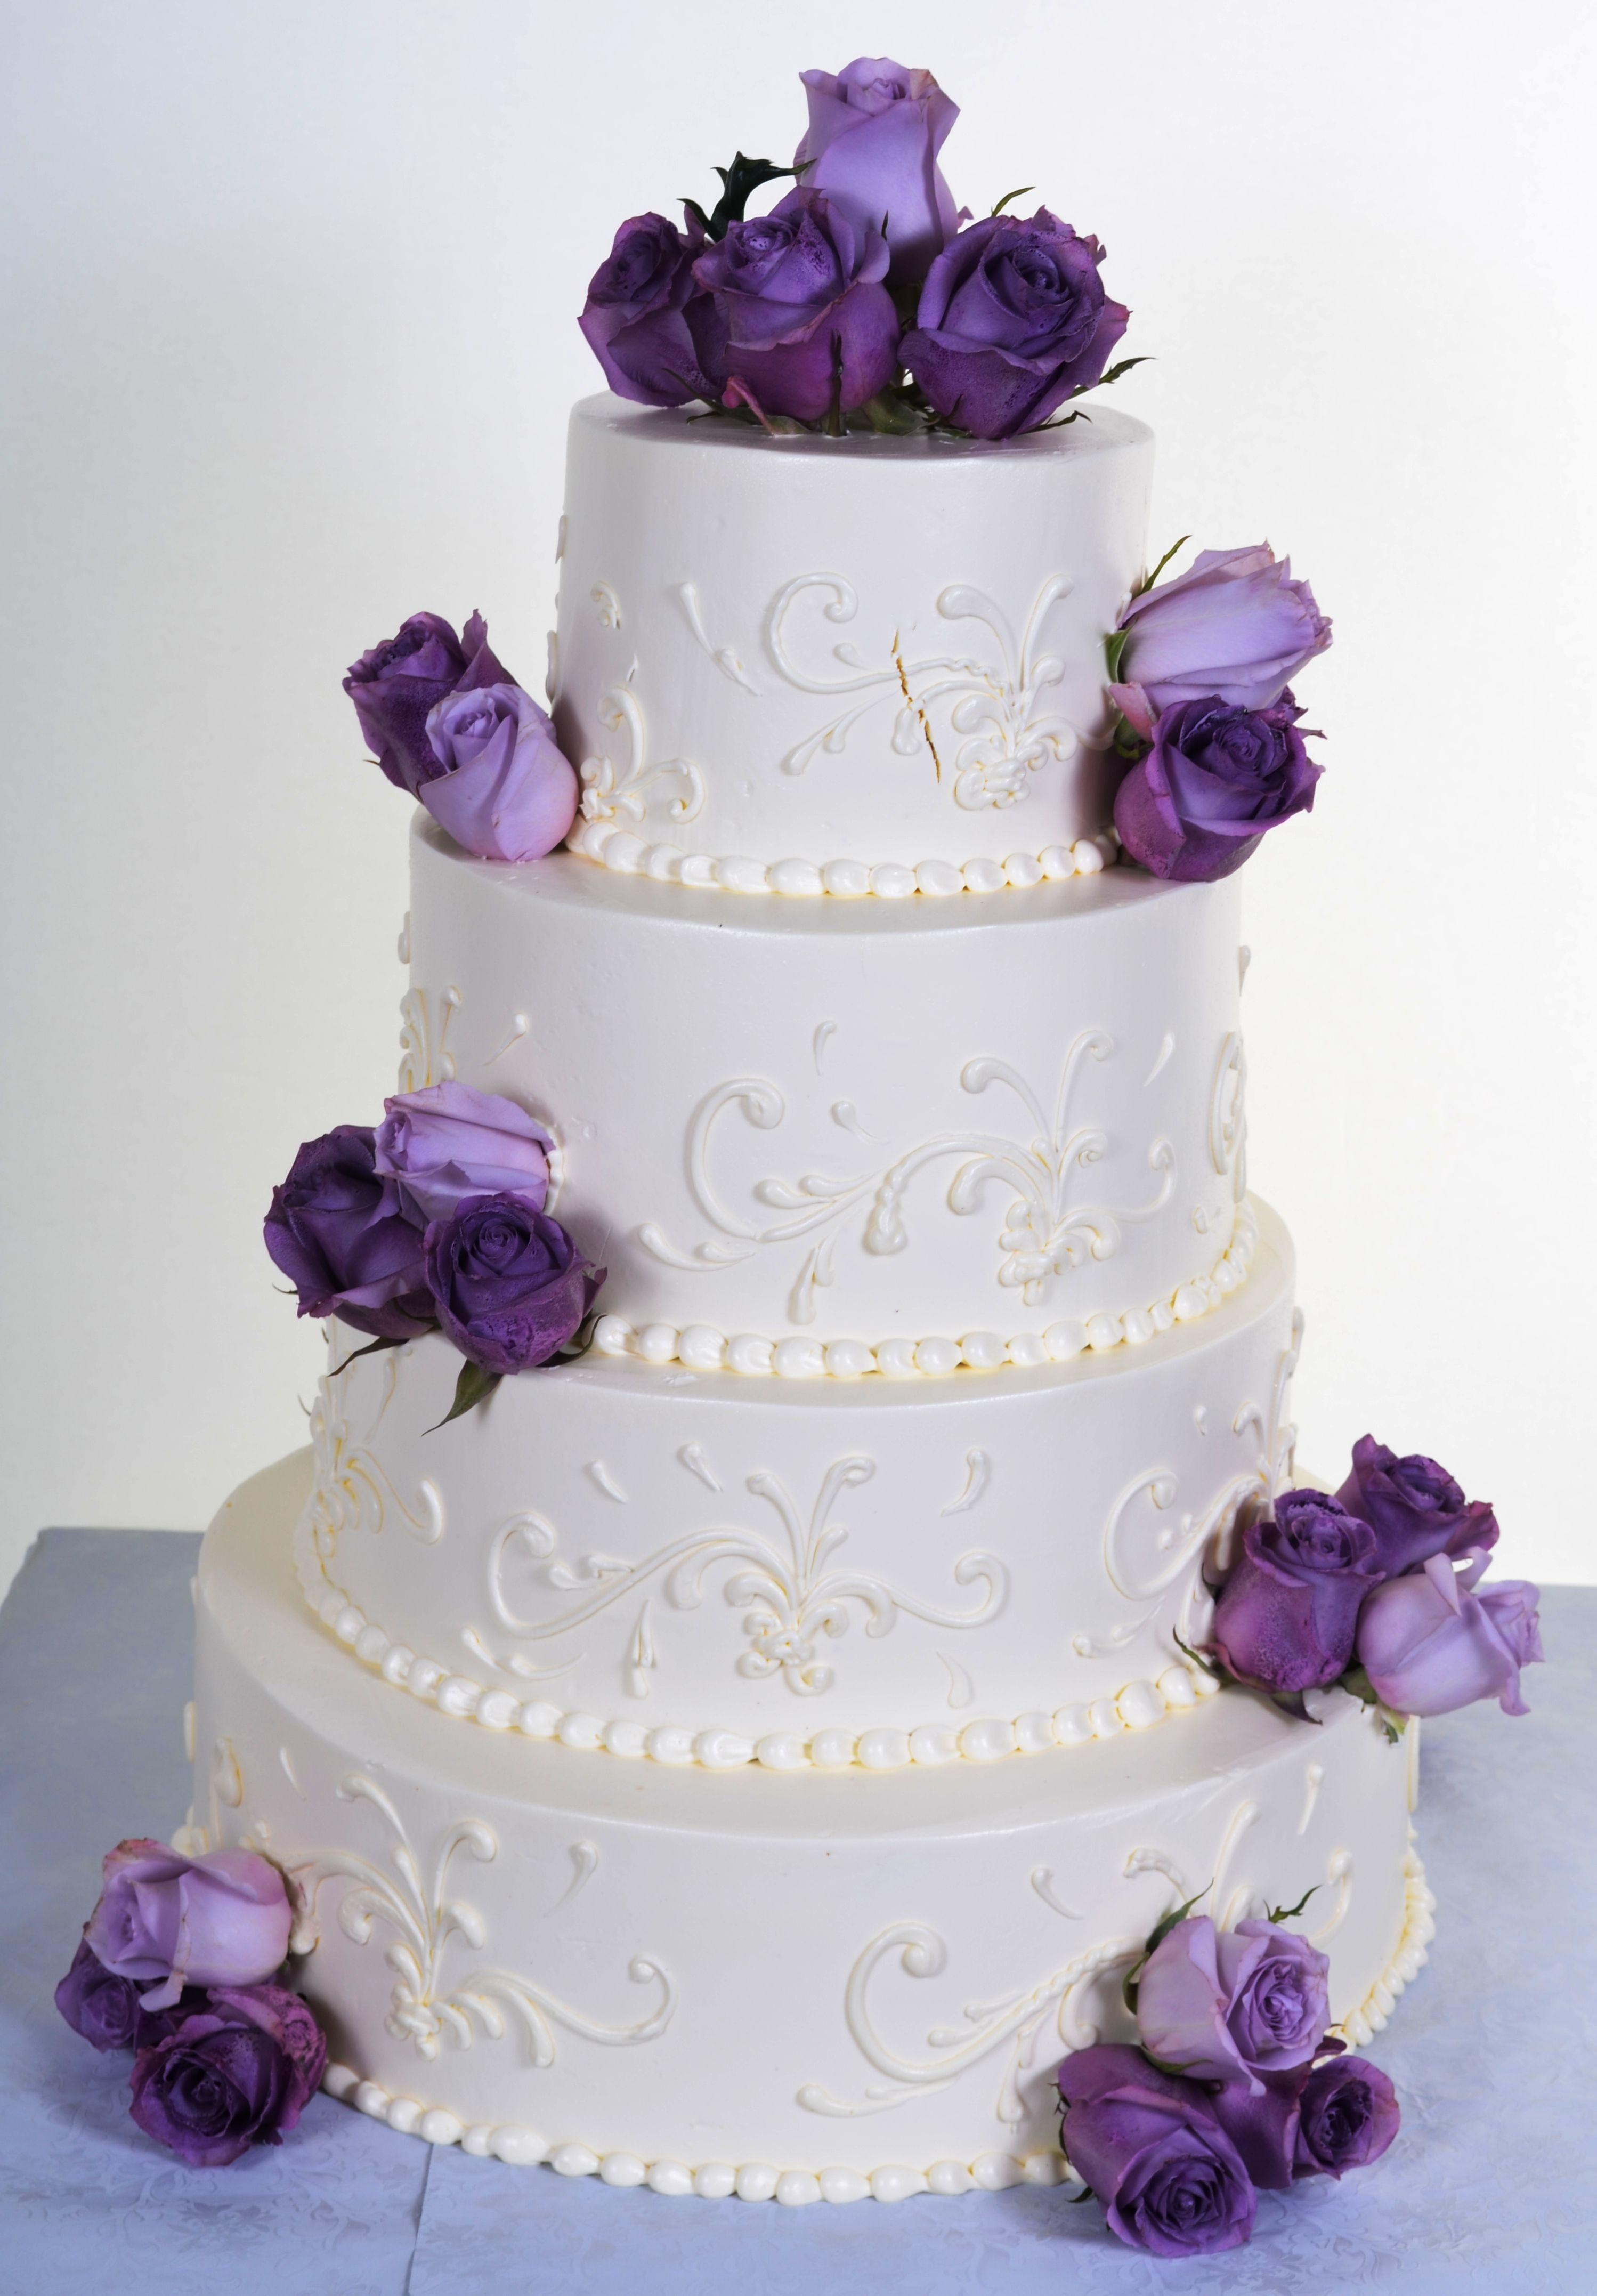 Pastry Palace Las Vegas - Wedding Cake #813 – White On White – With ...